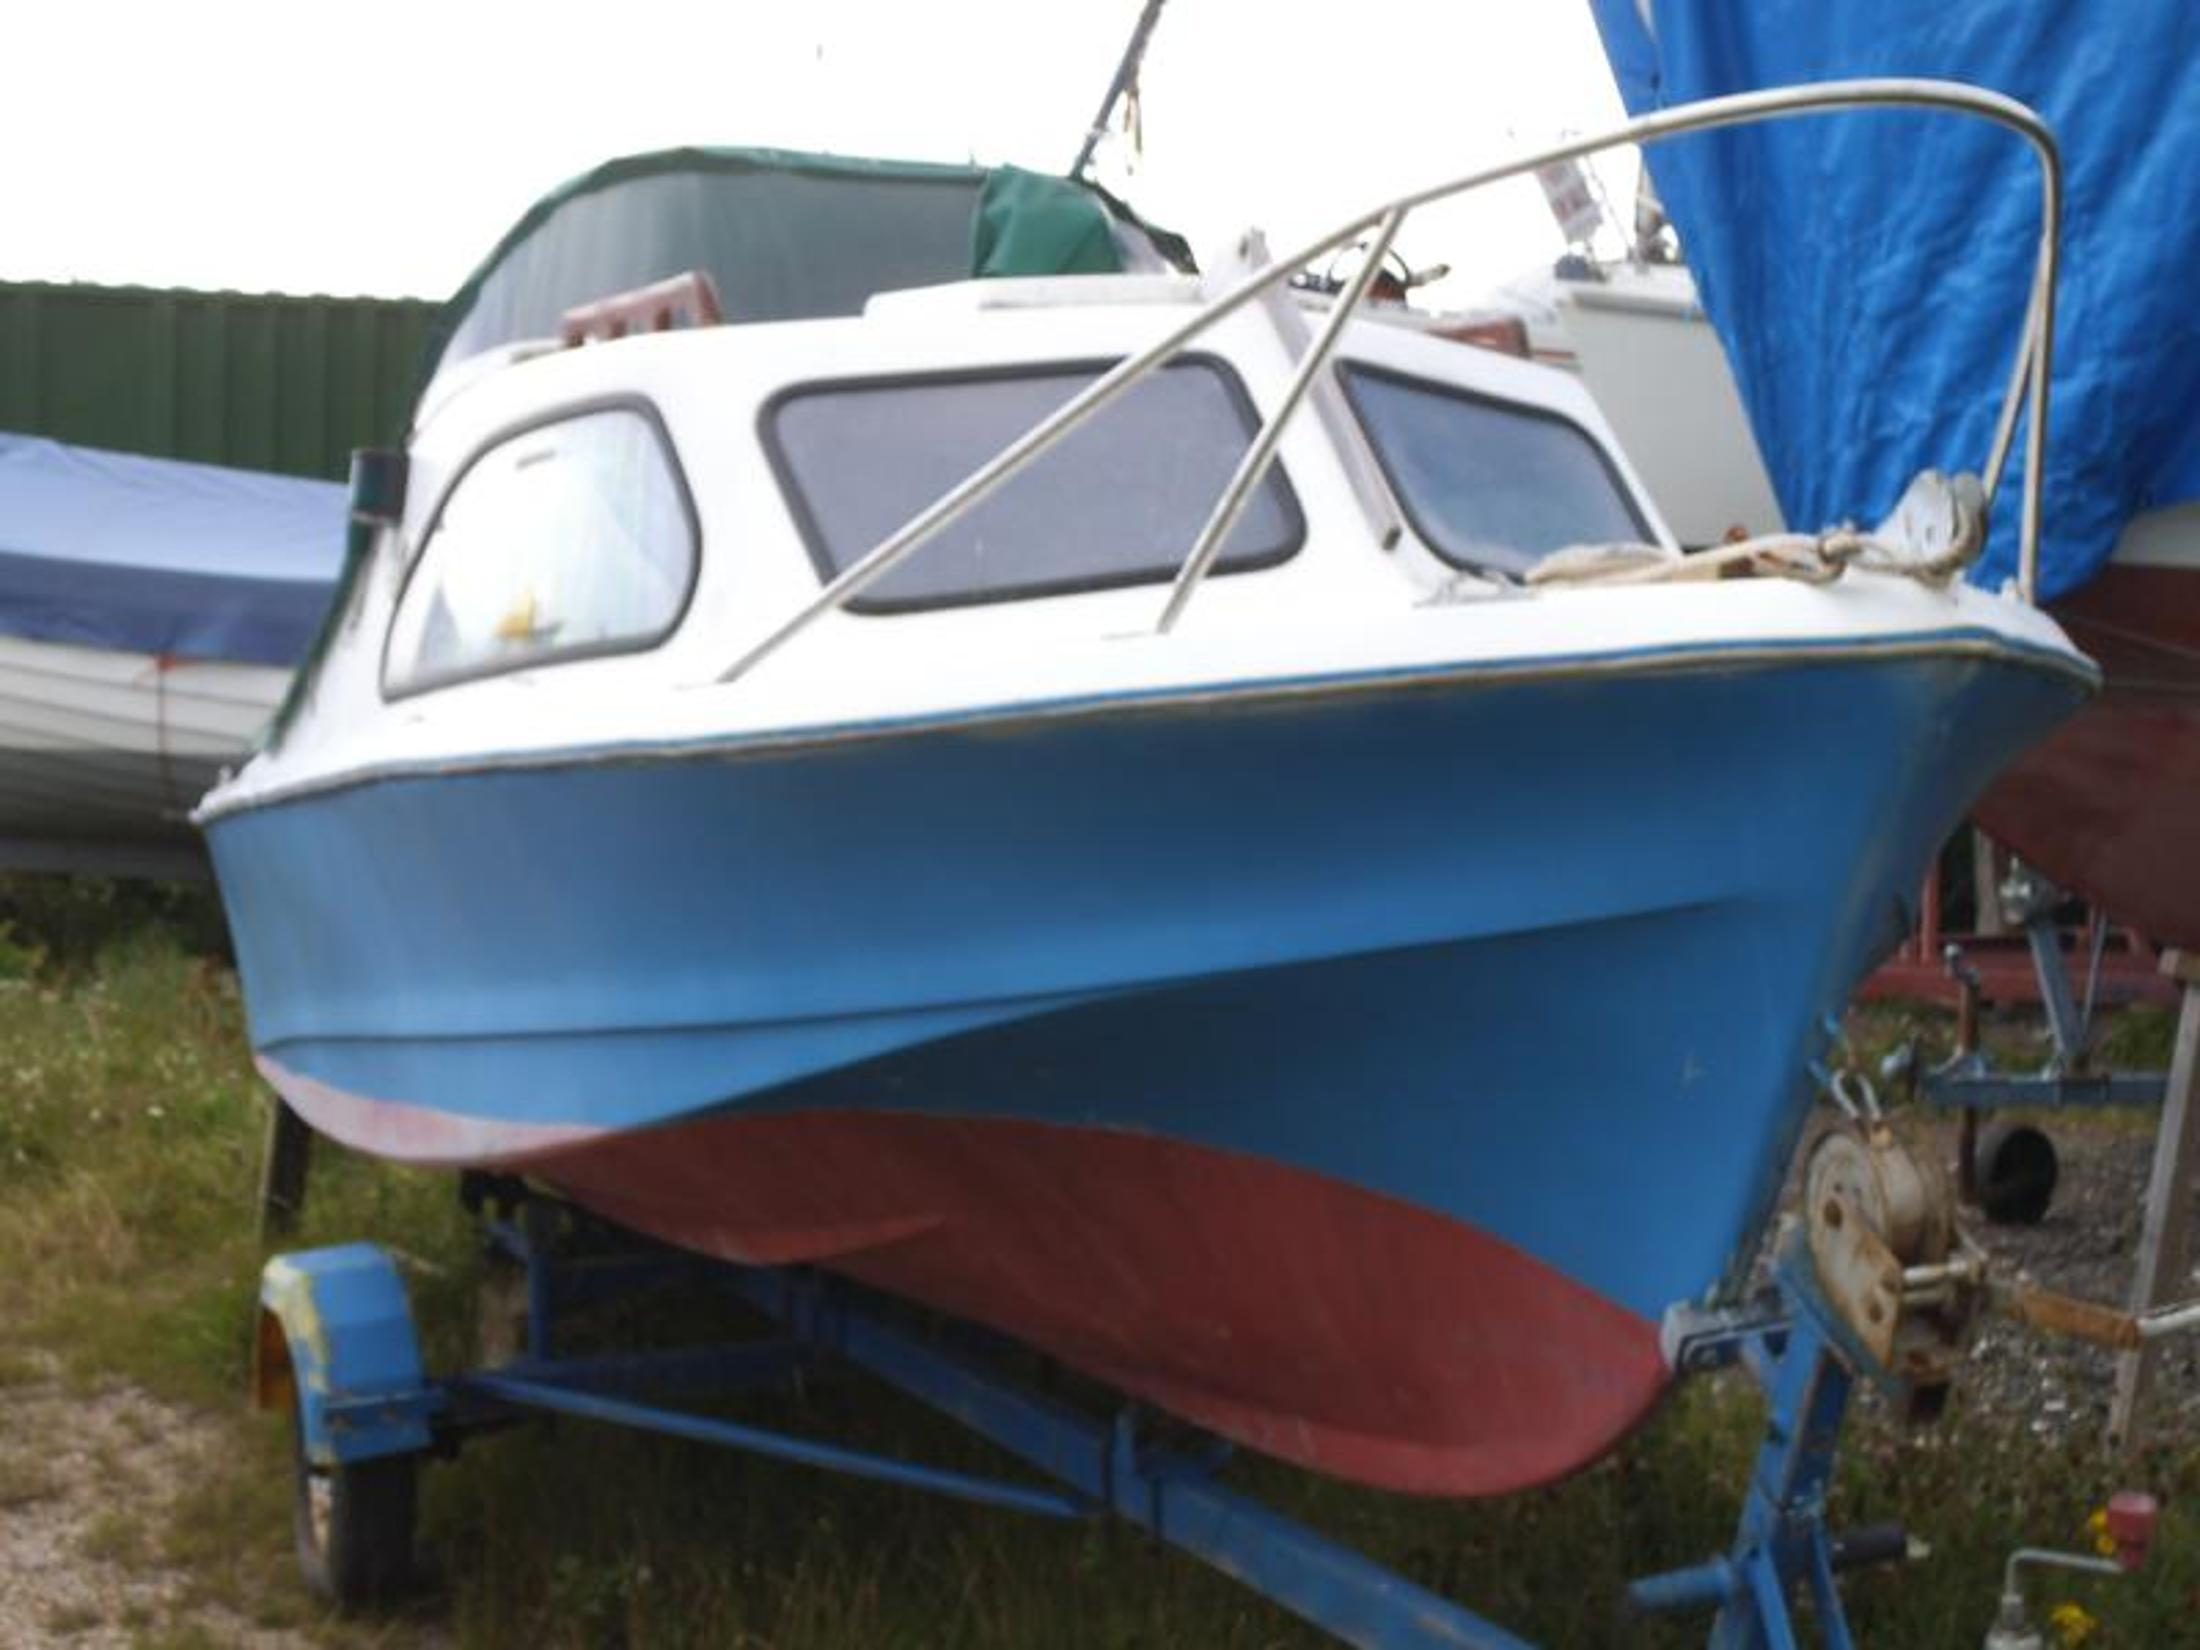 Shetland 535 Fishing Boat, Walton On The Naze, Essex